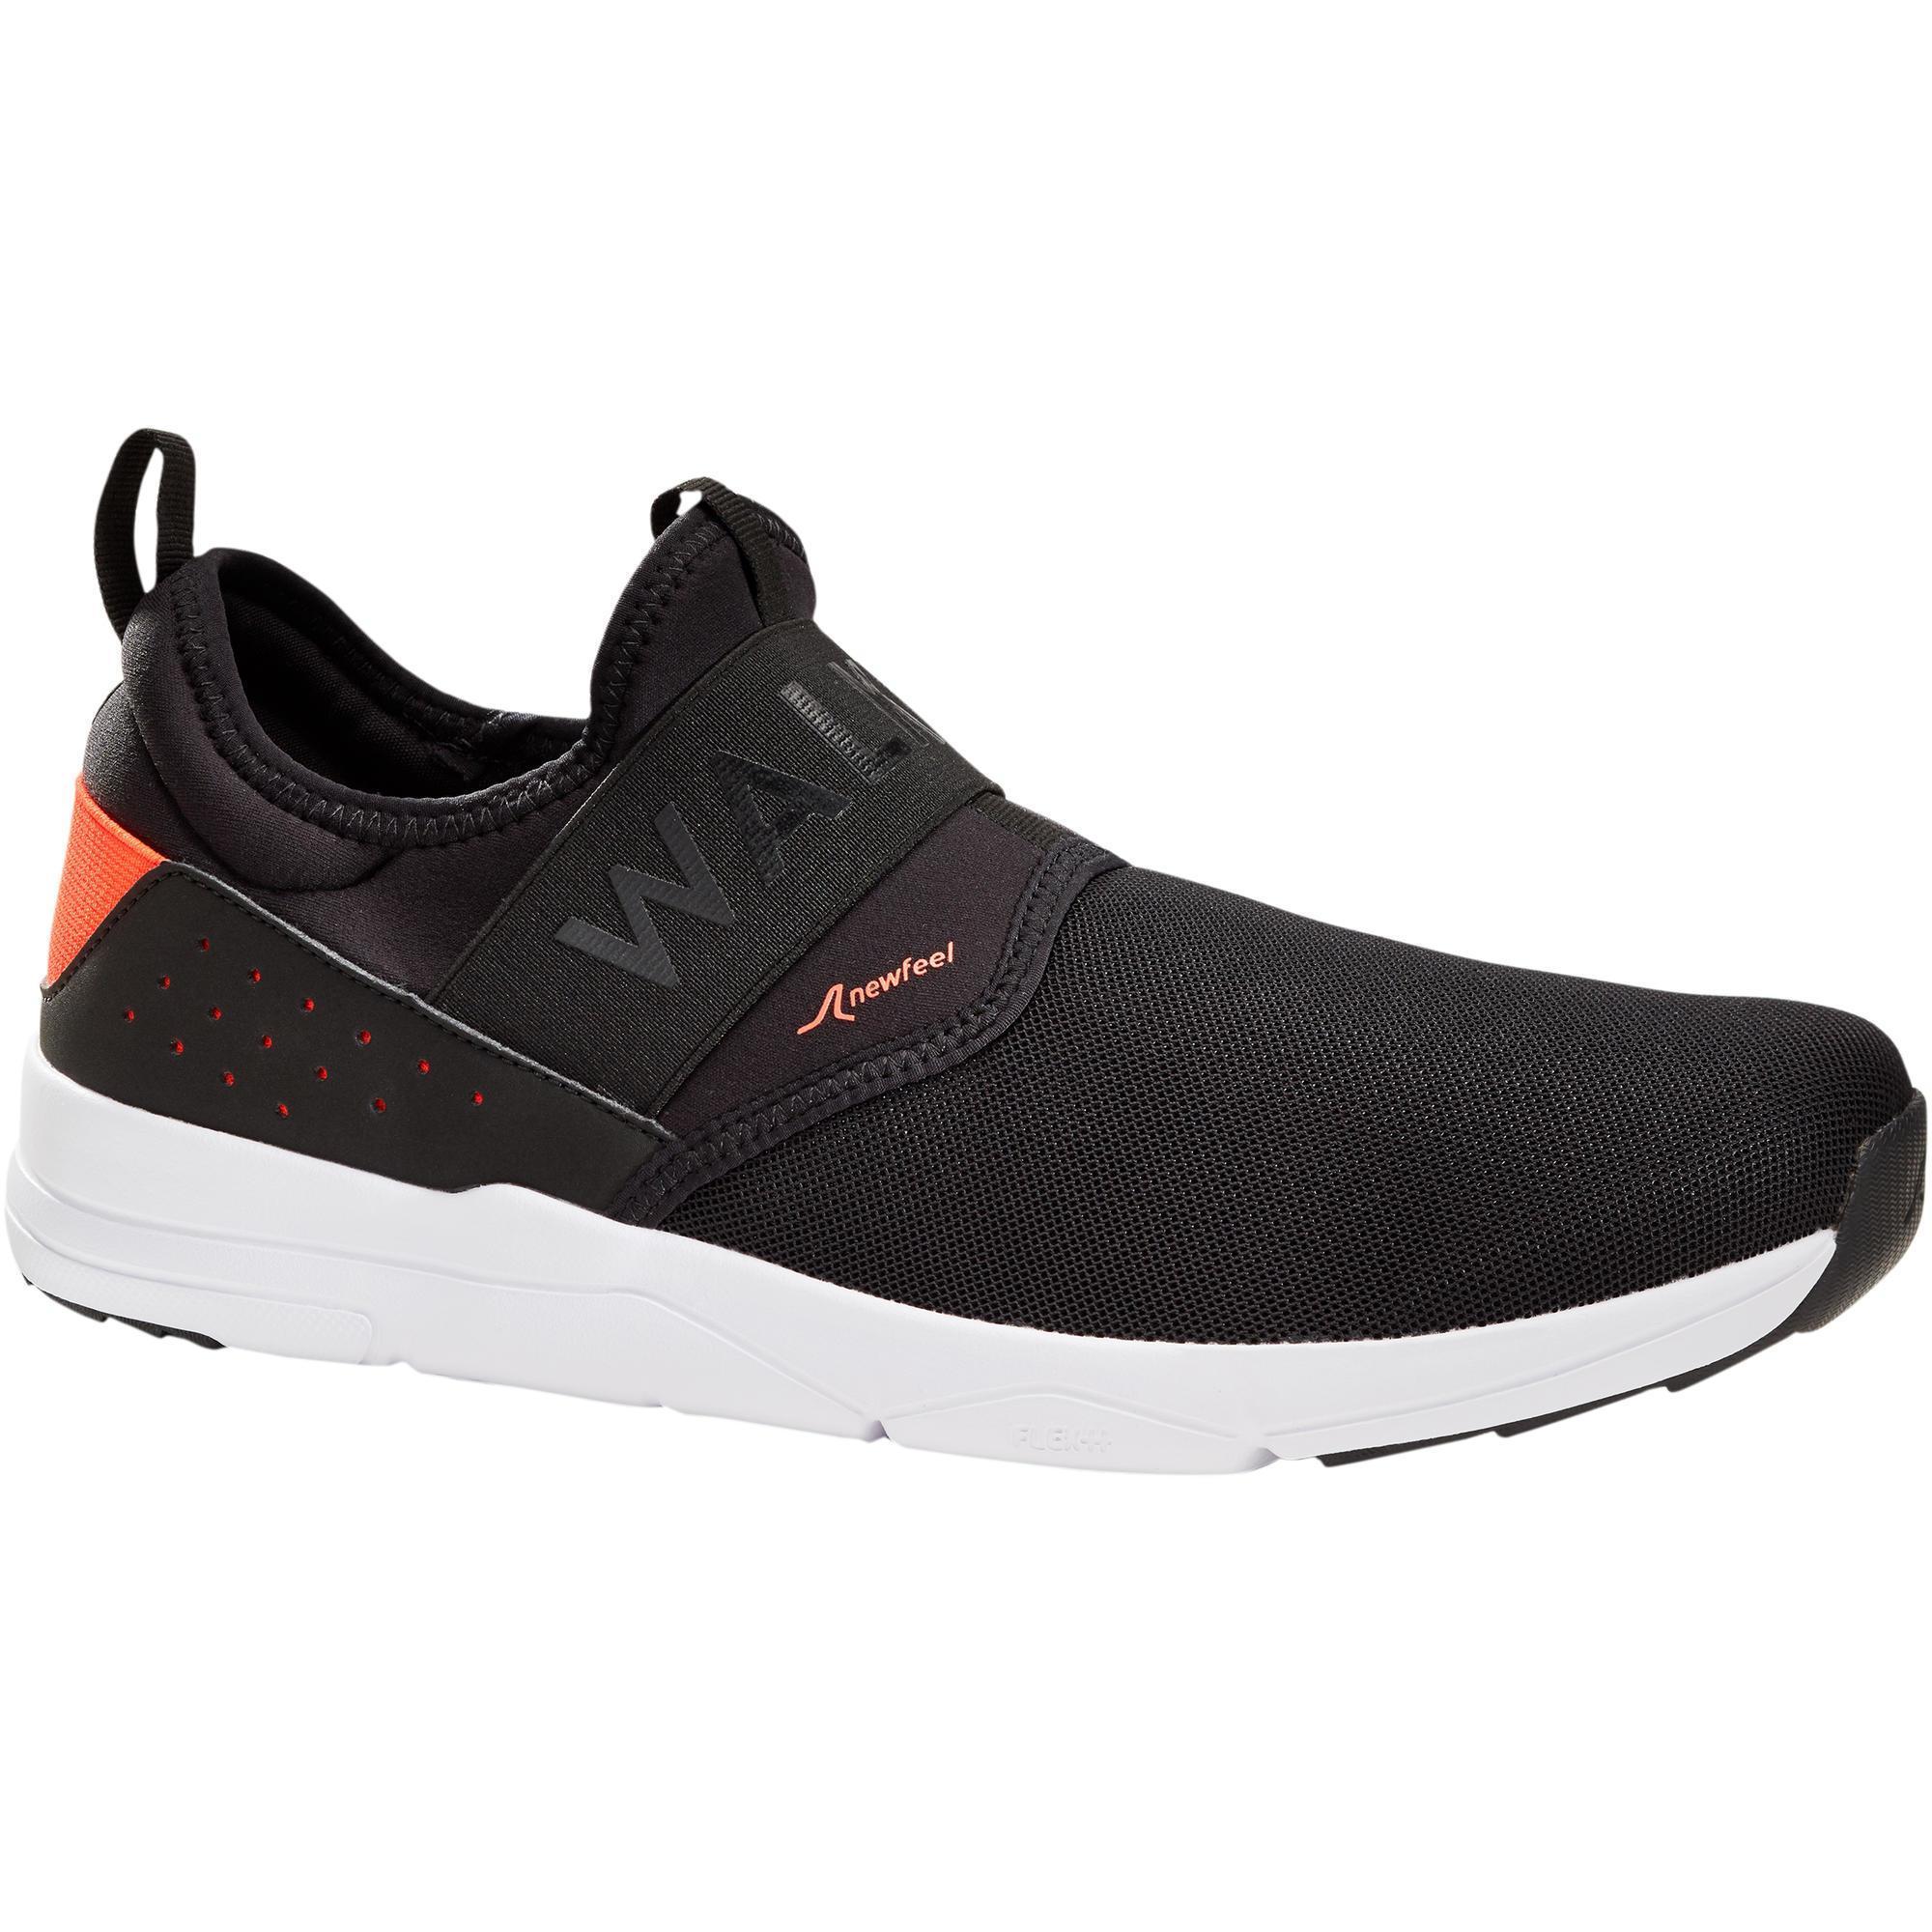 Newfeel Chaussures marche sportive homme PW 160 Slip-On noir / orange - Newfeel